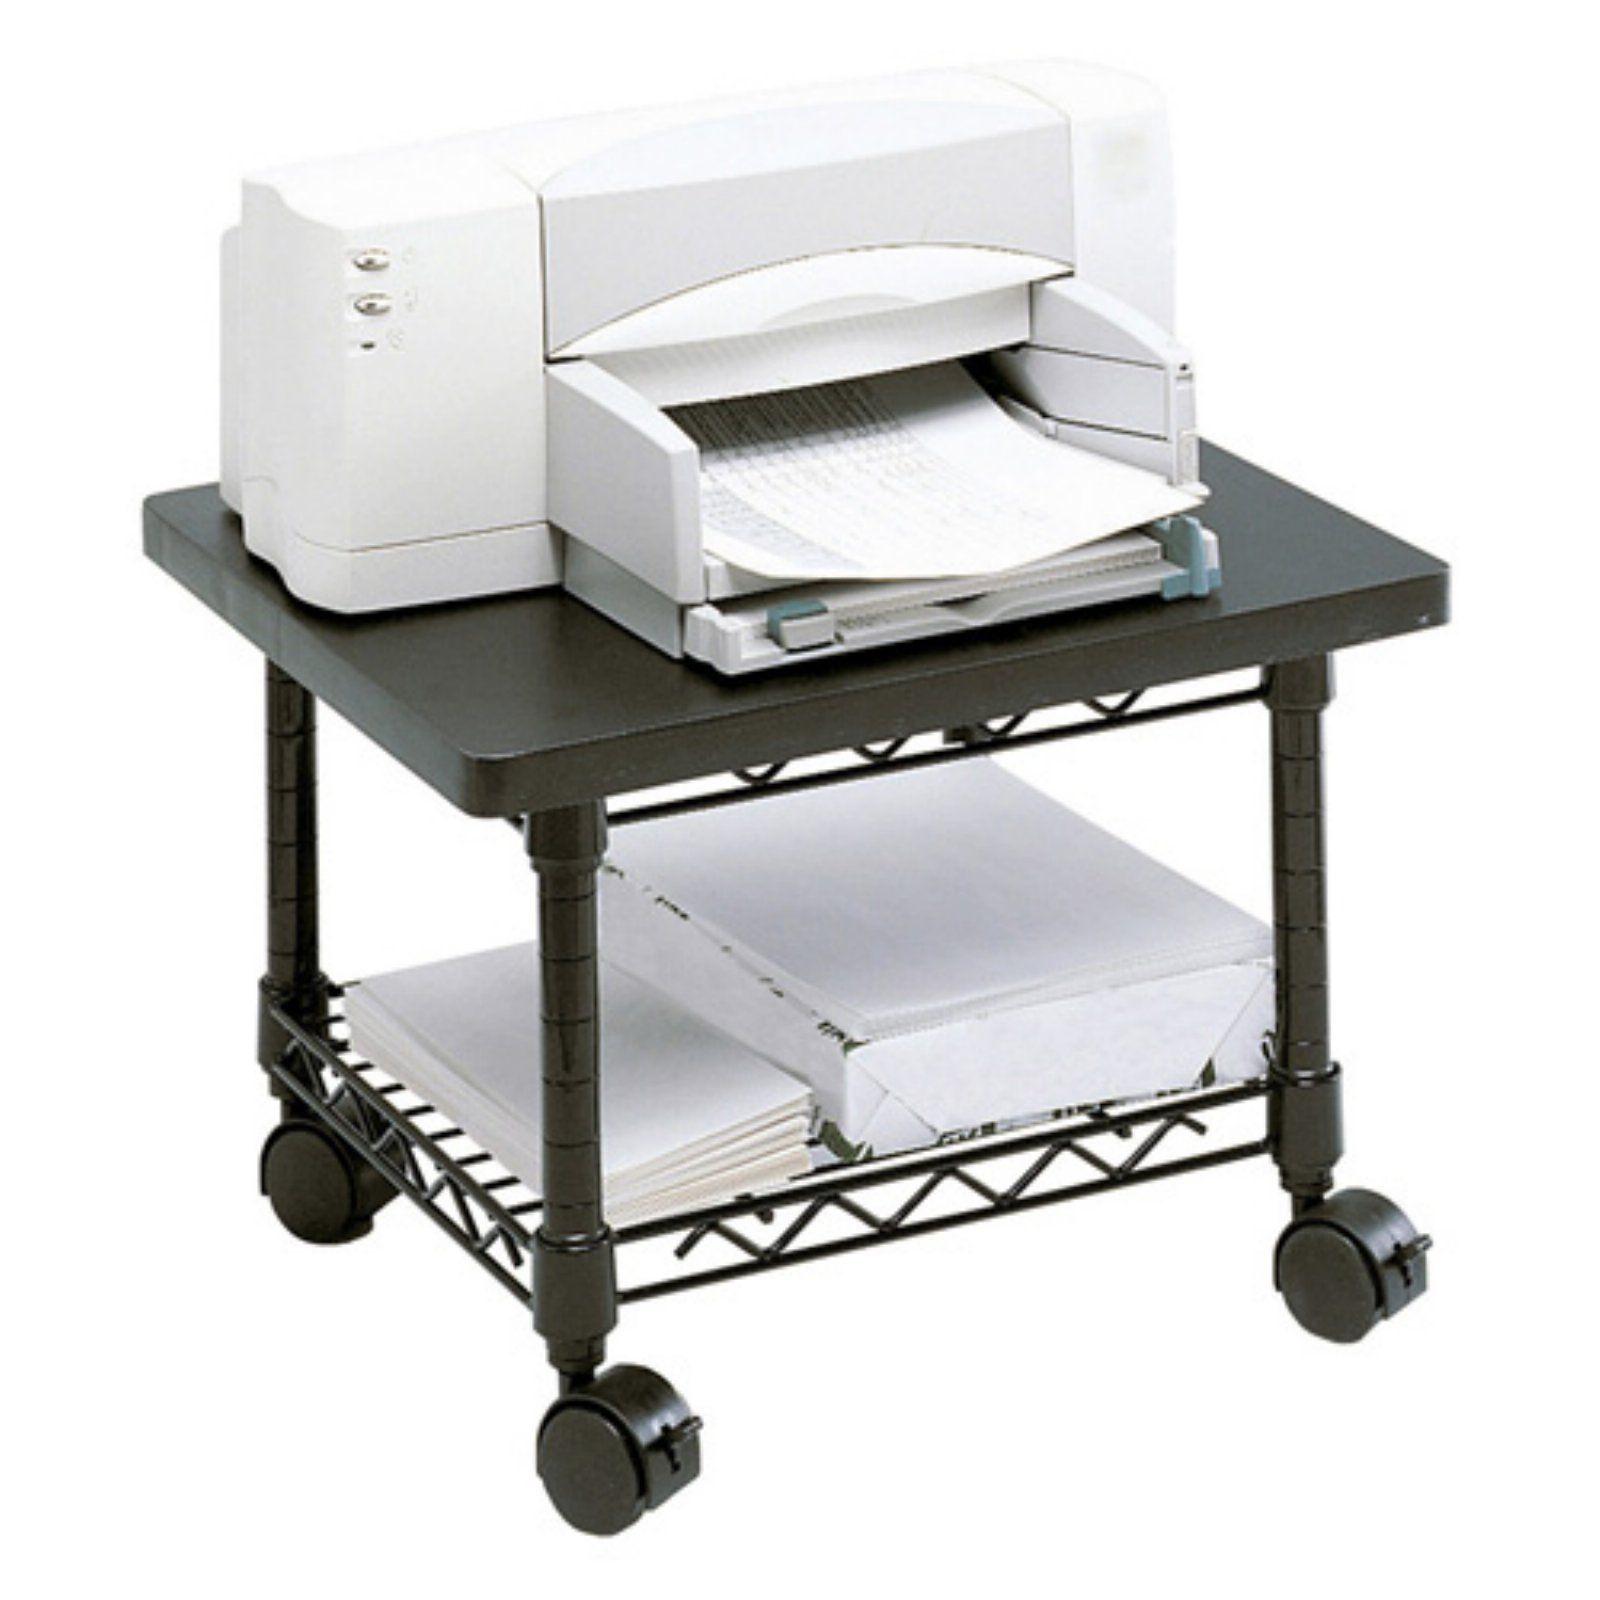 Safco 5206bl Under Desk Printer Fax Stand Black Printer Stand Desk Office Furniture